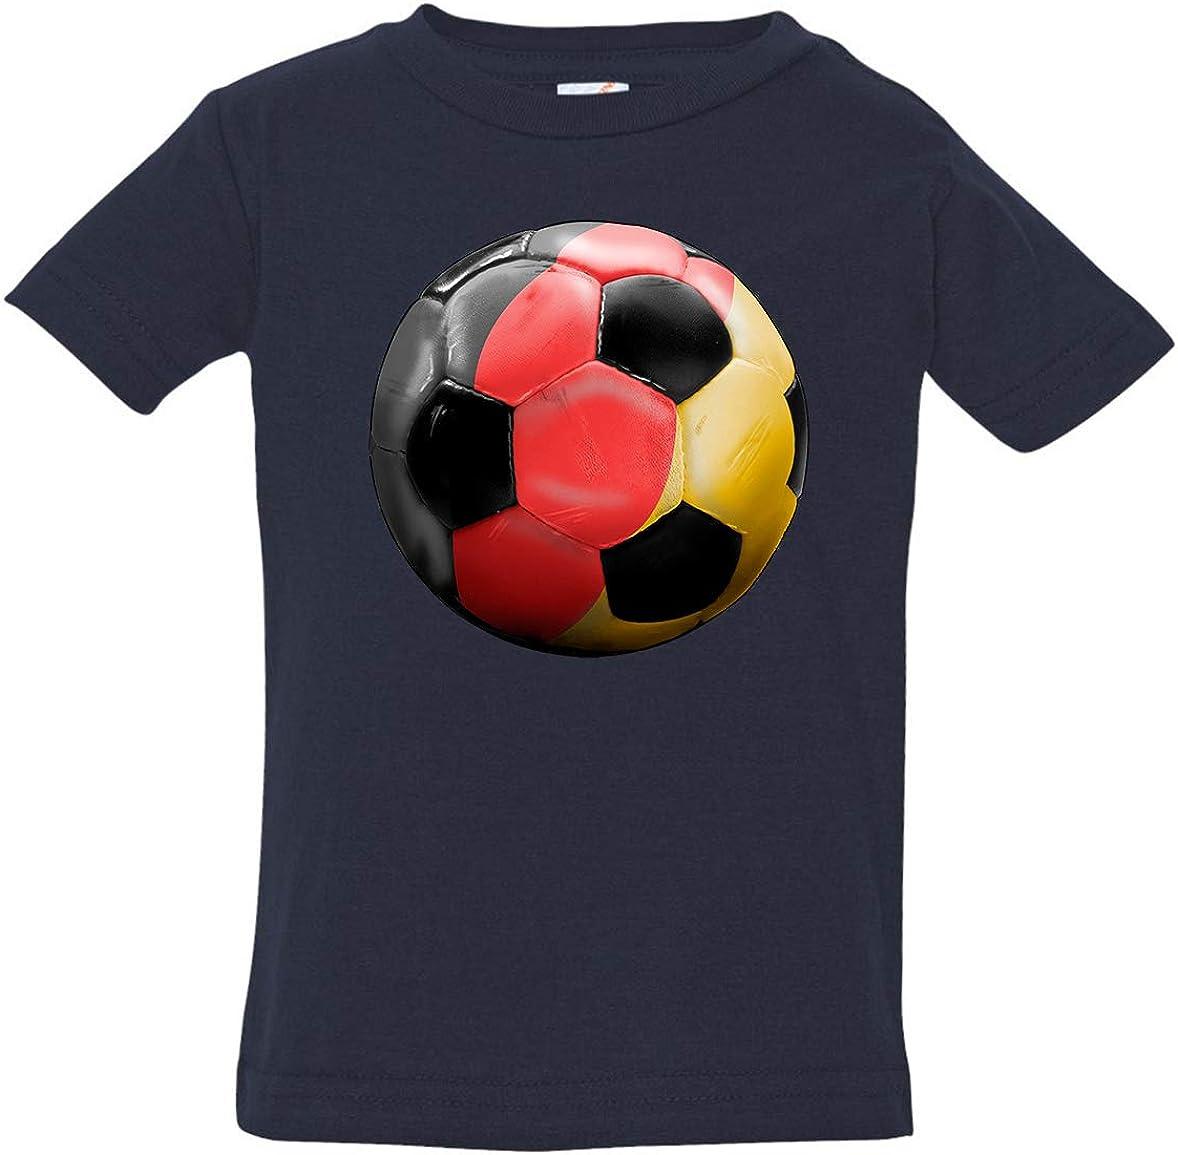 Tenacitee Babys Germany Soccer Shirt